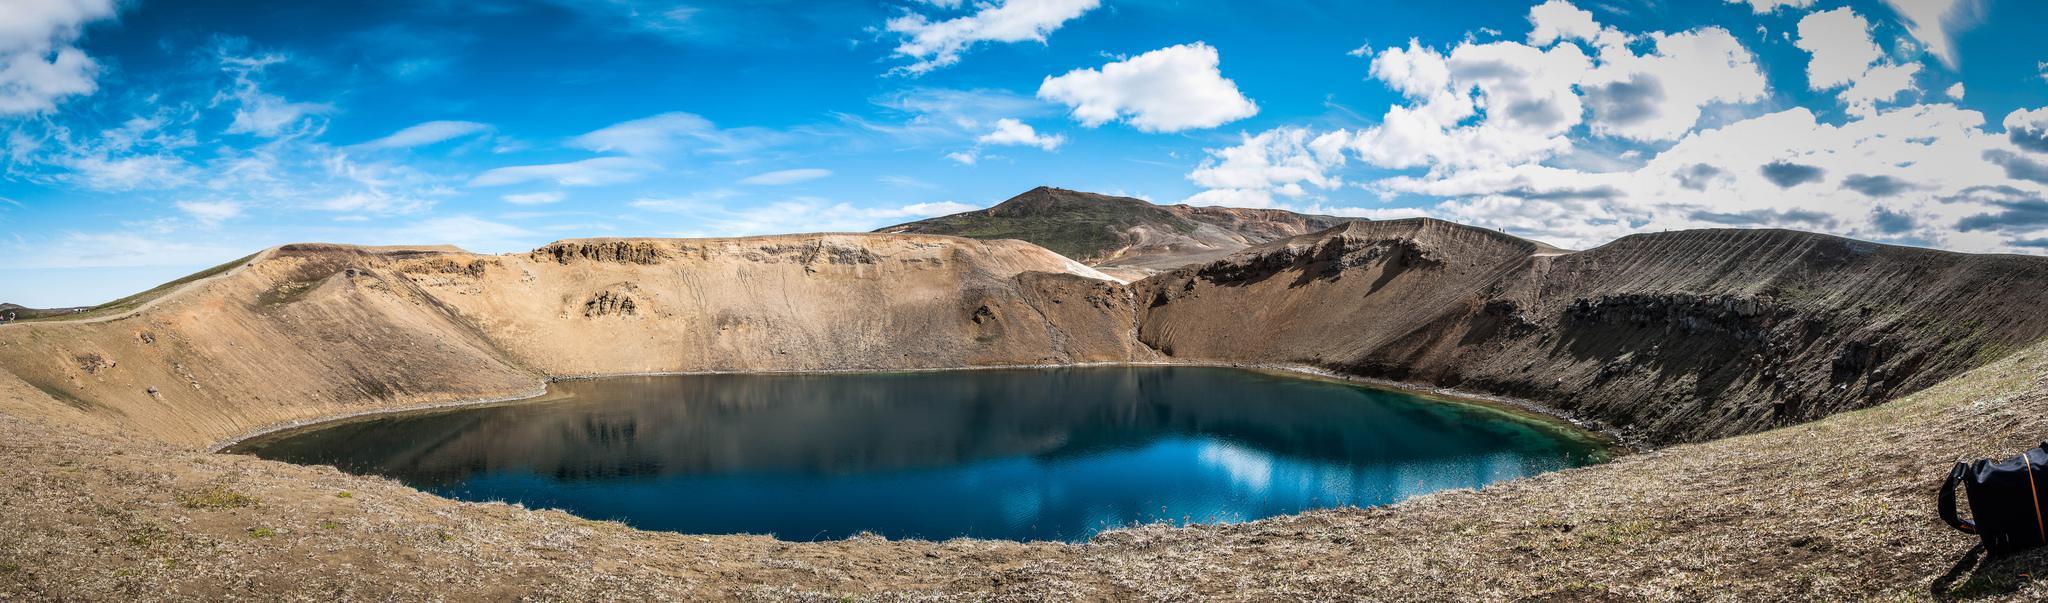 Mývatn (Myvatn) - cratère et lac en Islande